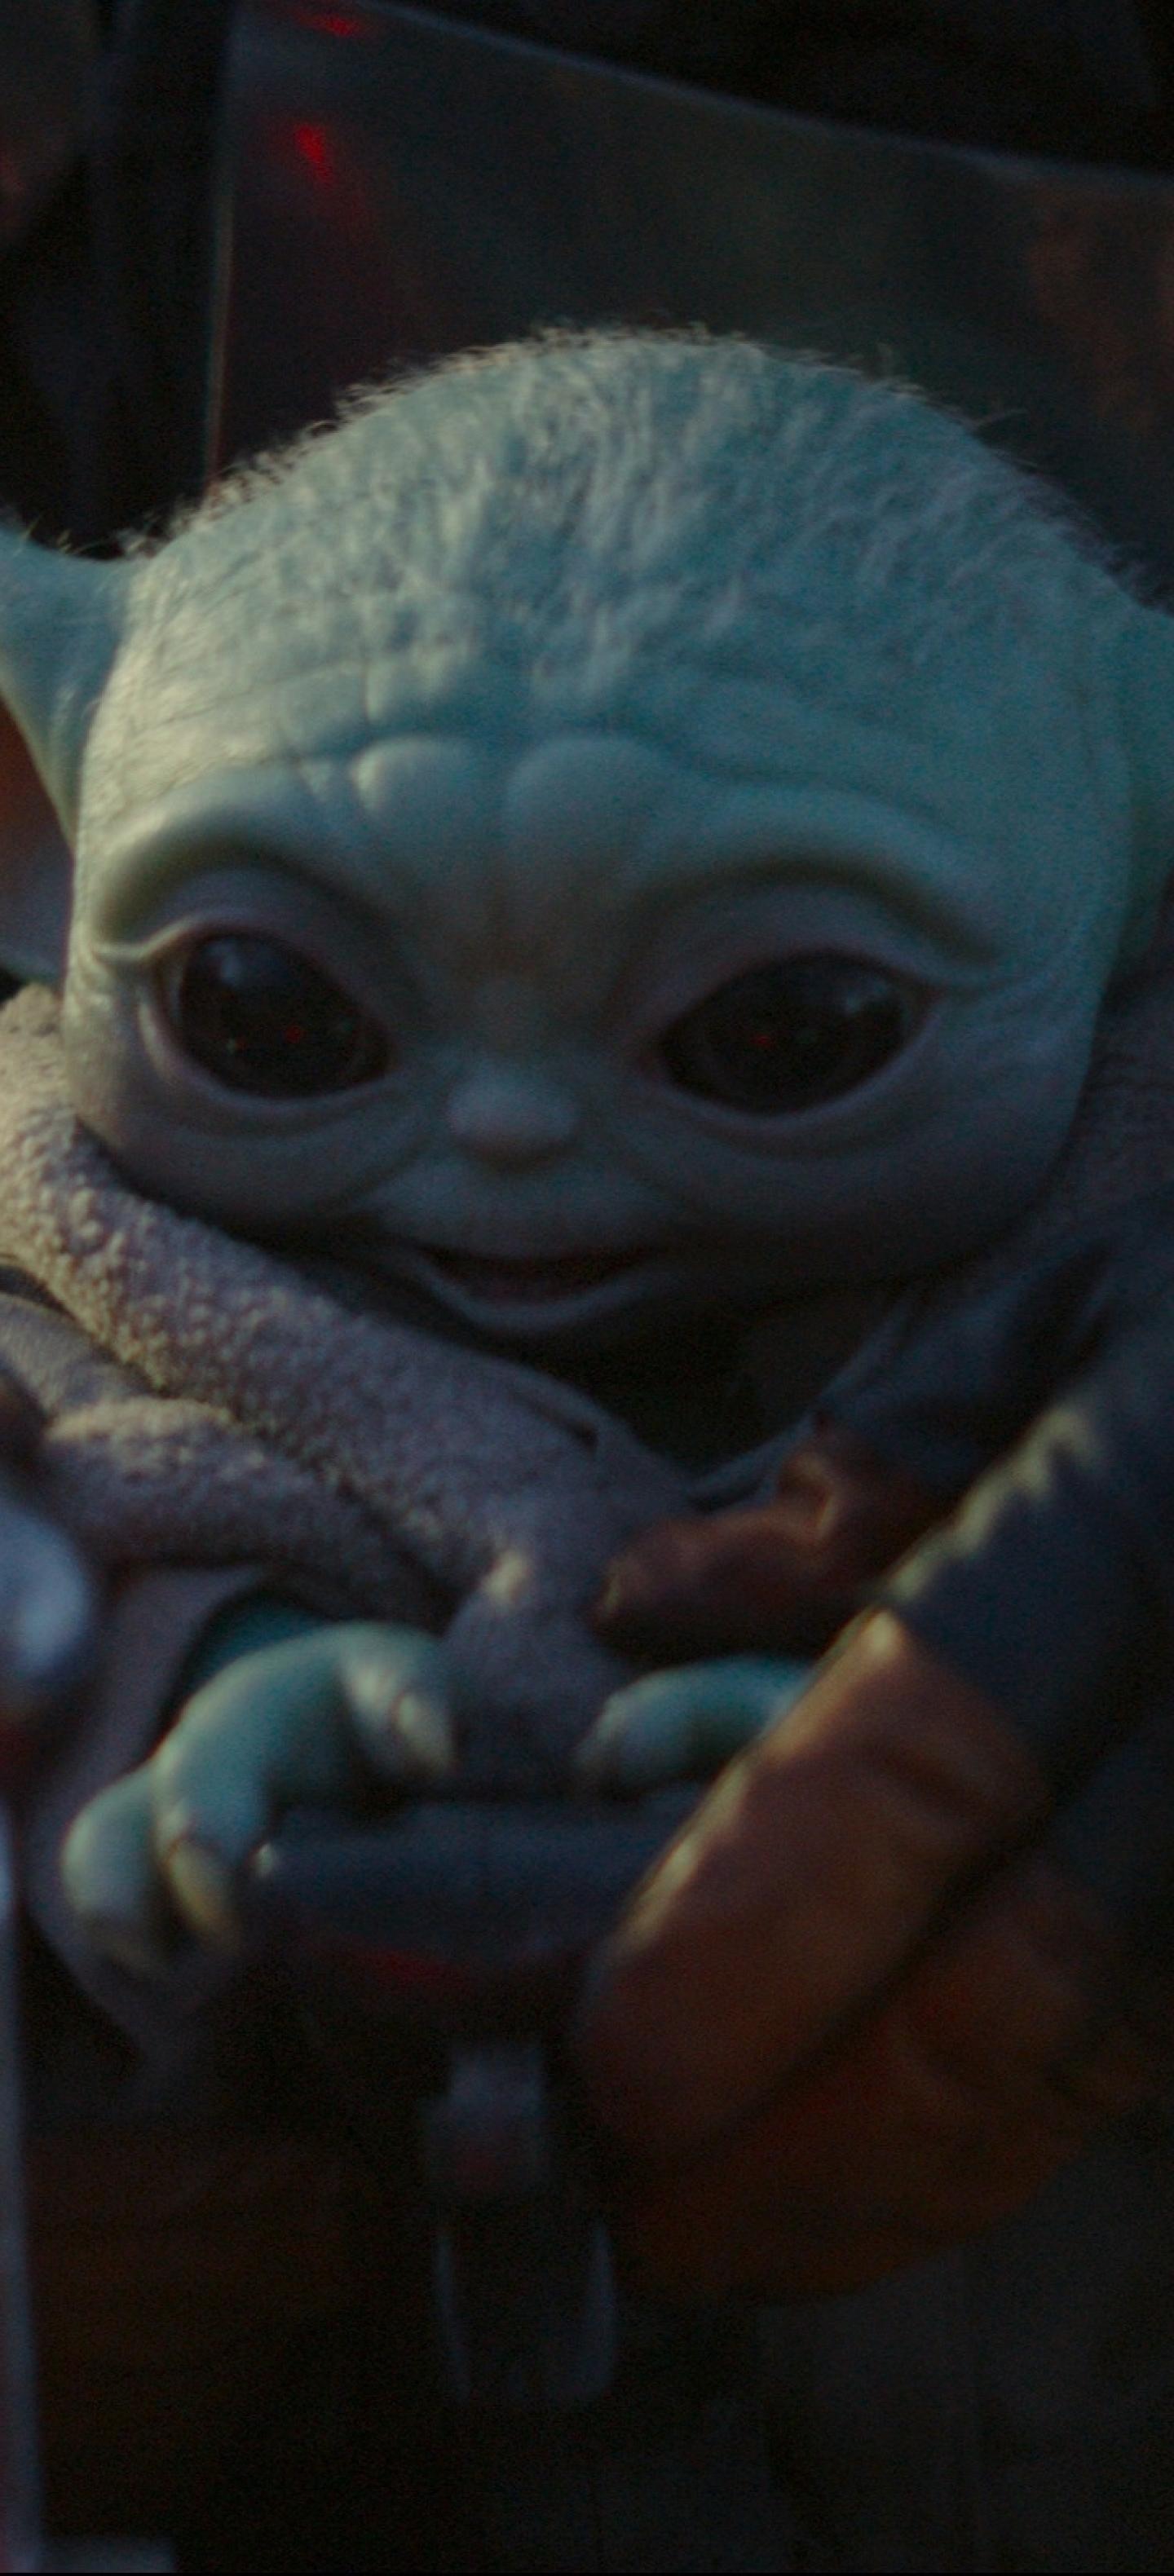 1440x3160 Baby Yoda The Mandalorian 4K 1440x3160 ...